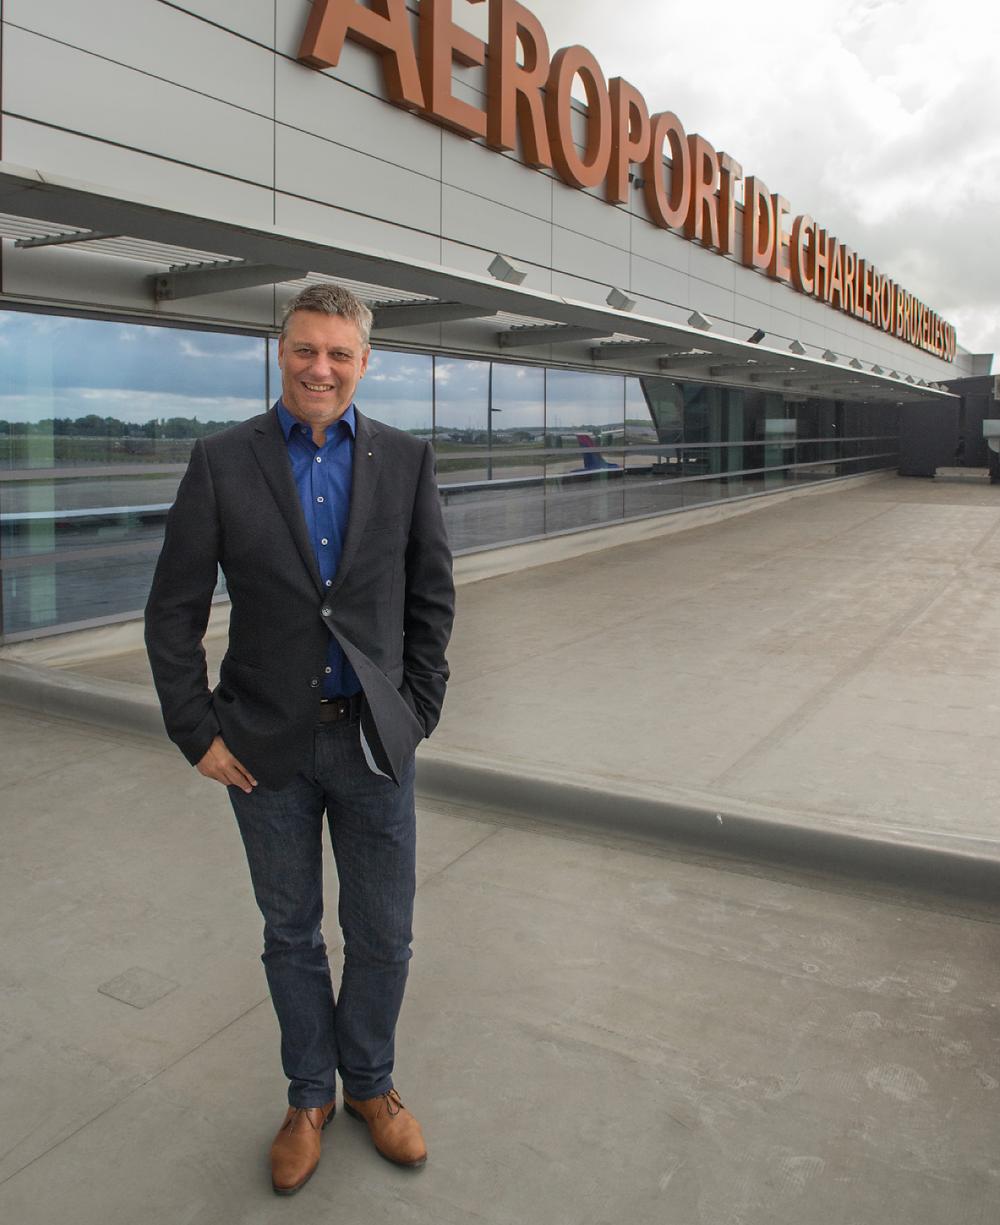 Denis Tellier, algemeen directeur financiën & administratie bij Brussels South Charleroi Airport